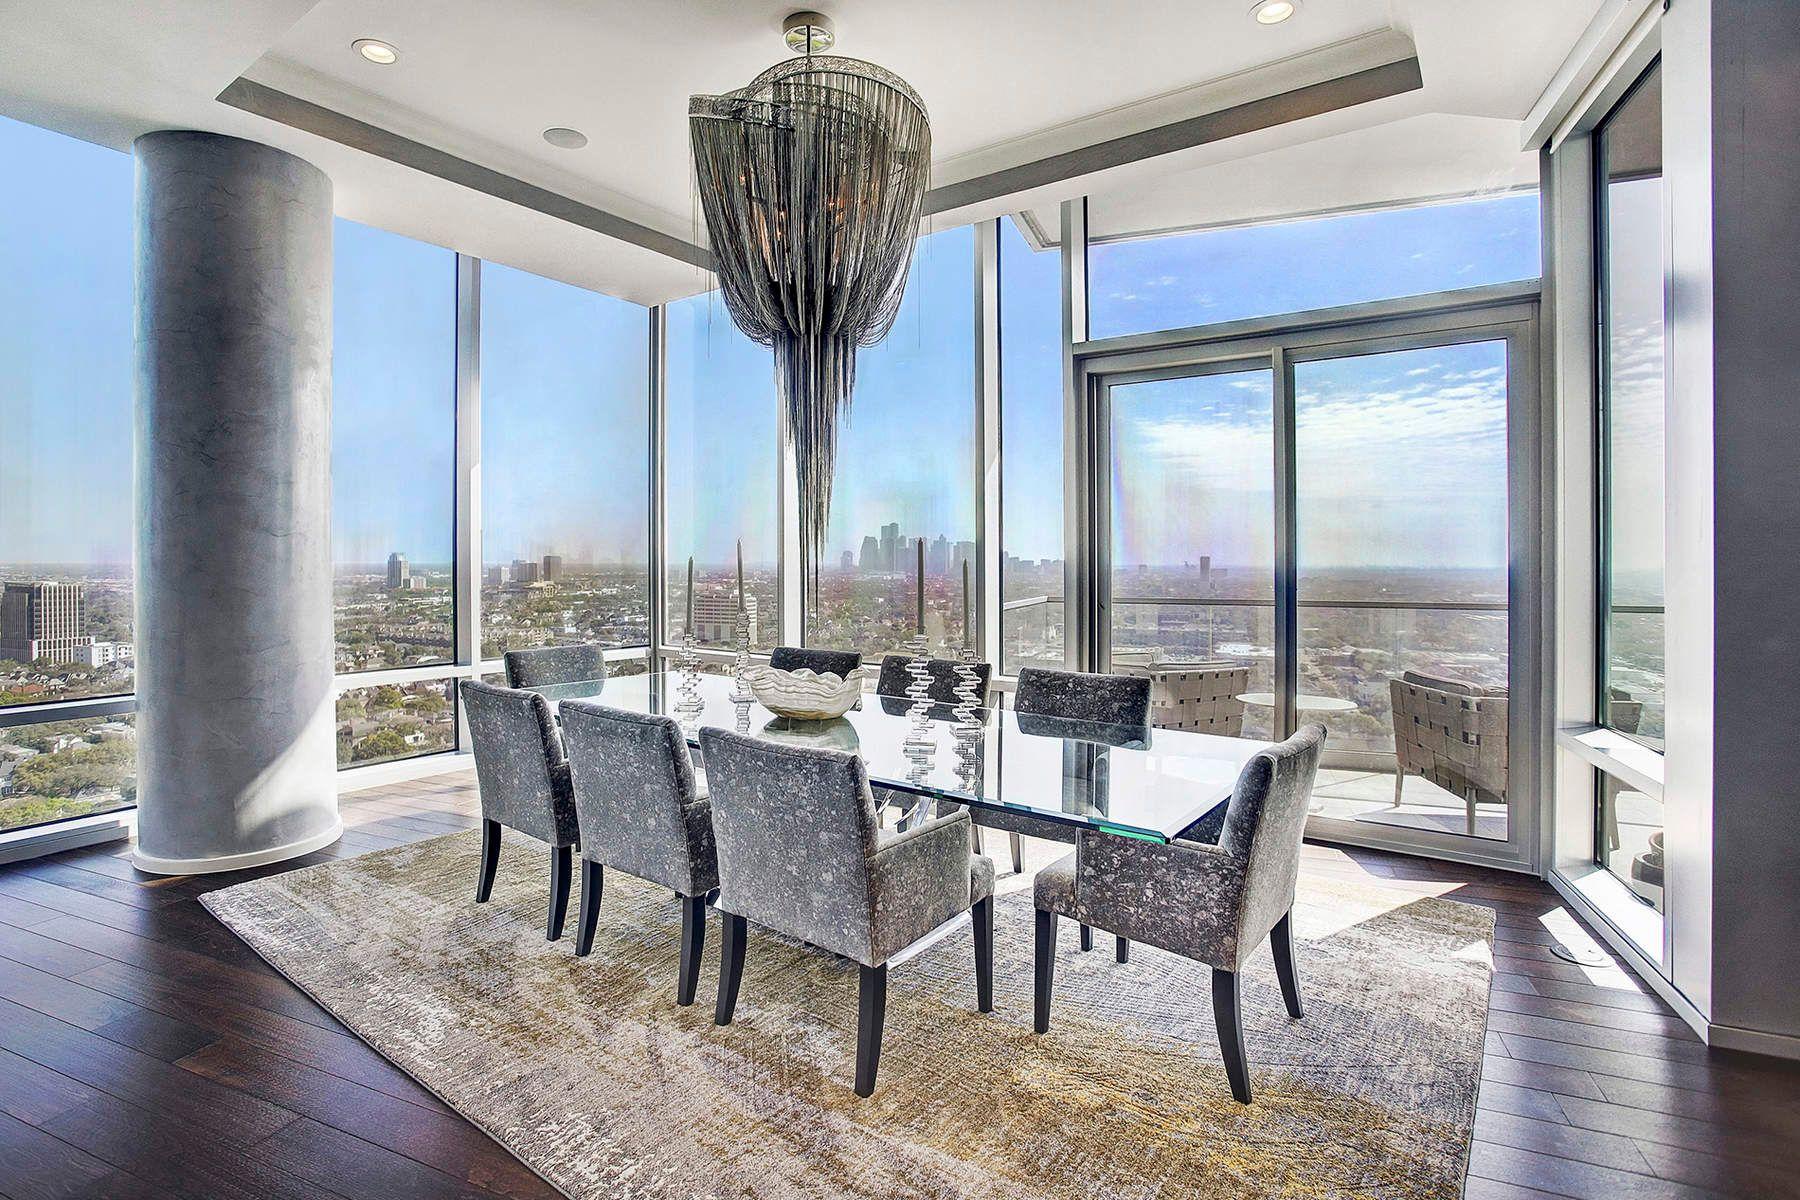 شقة للـ Sale في 2727 Kirby Drive 2727 Kirby Drive Unit 23I, Houston, Texas, 77098 United States